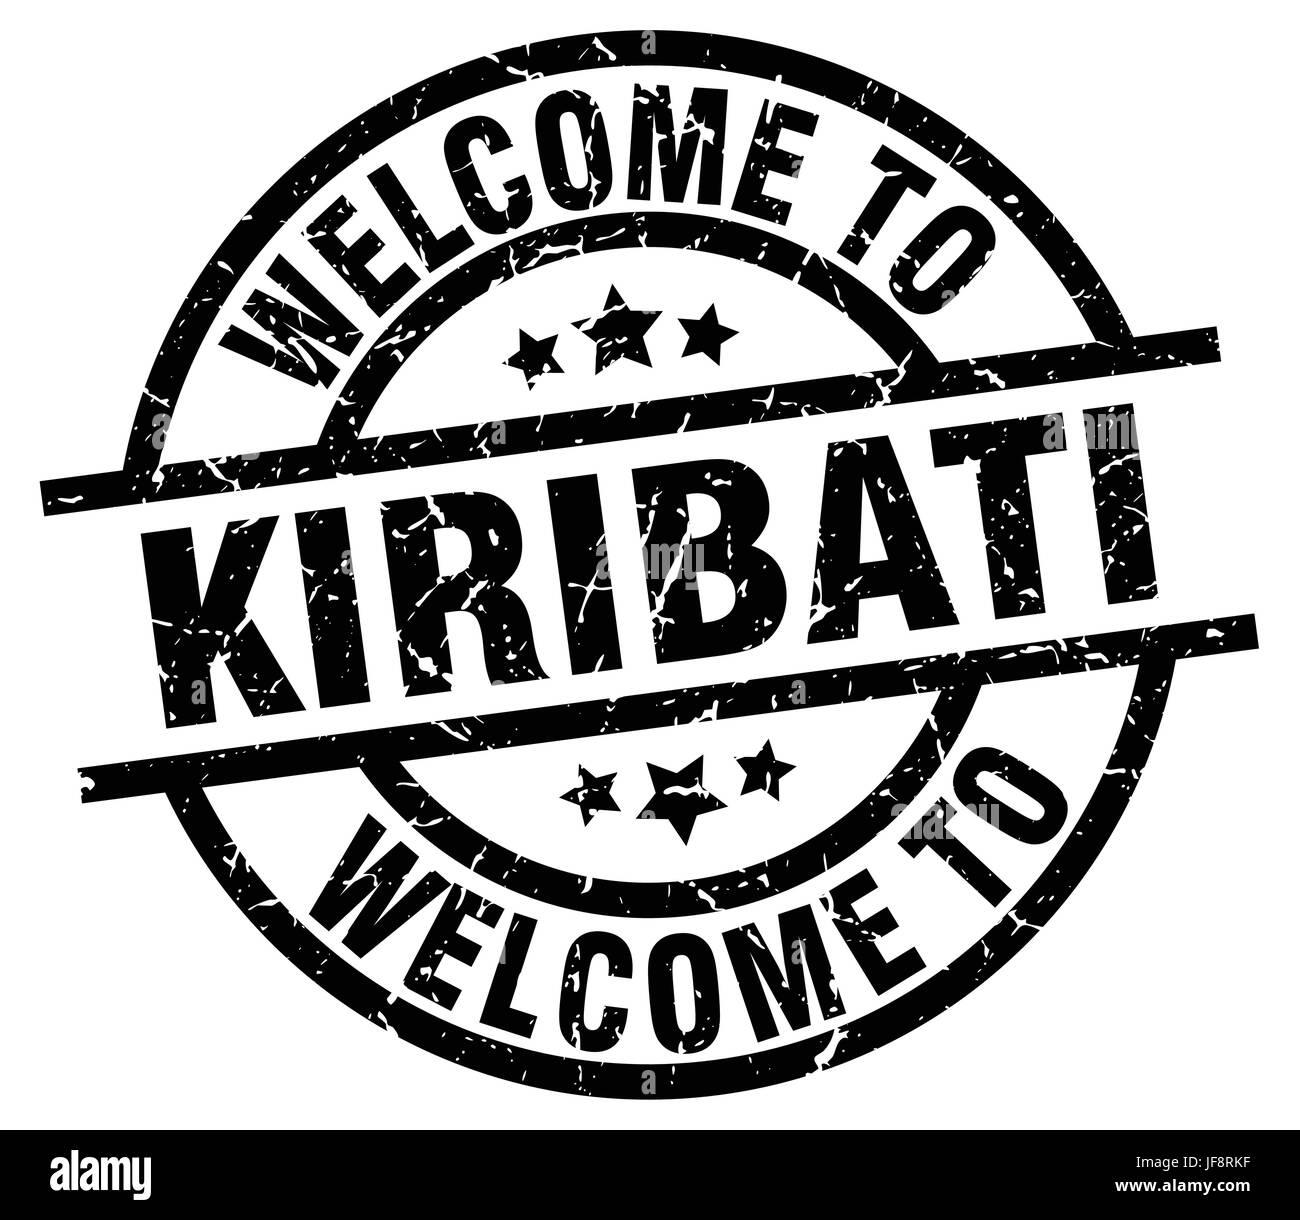 welcome to Kiribati black stamp - Stock Image